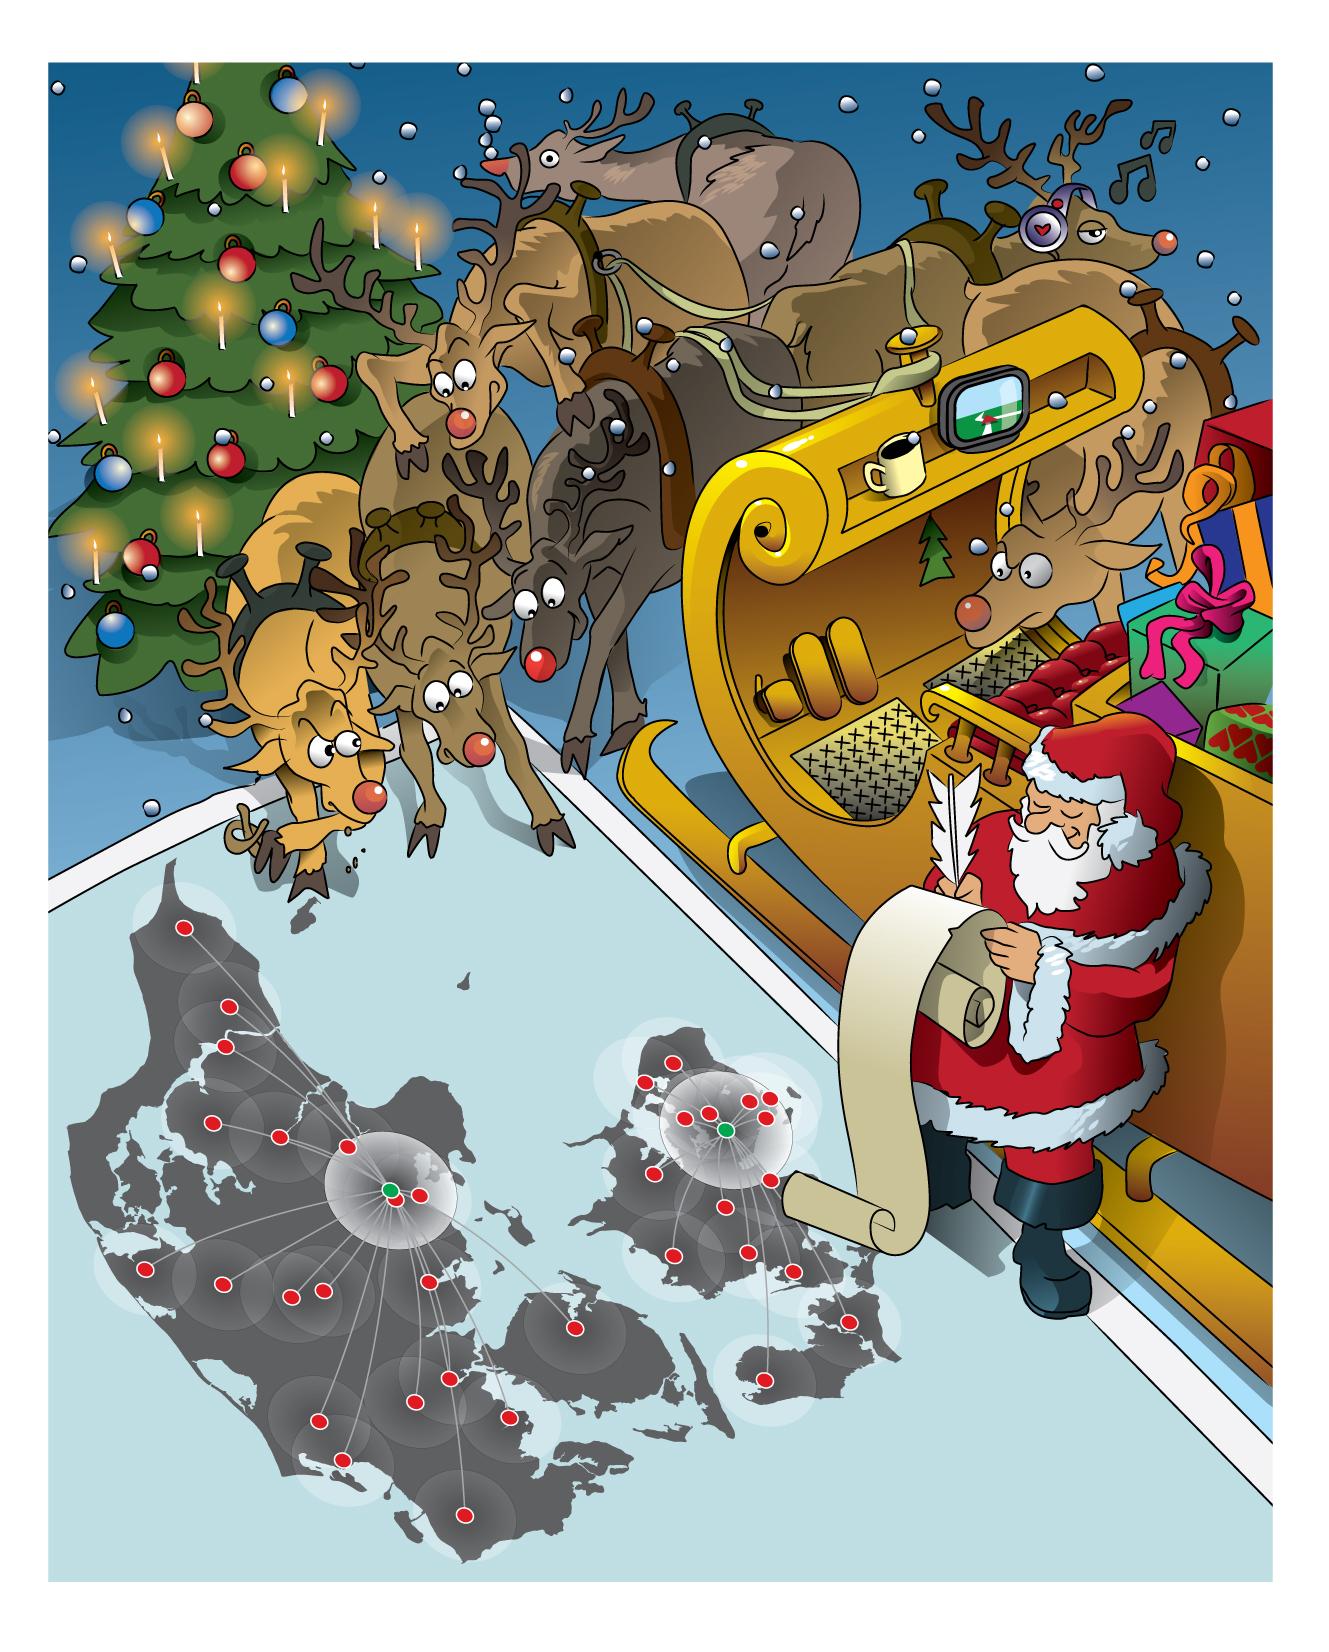 Christmas card by Sepiawolf